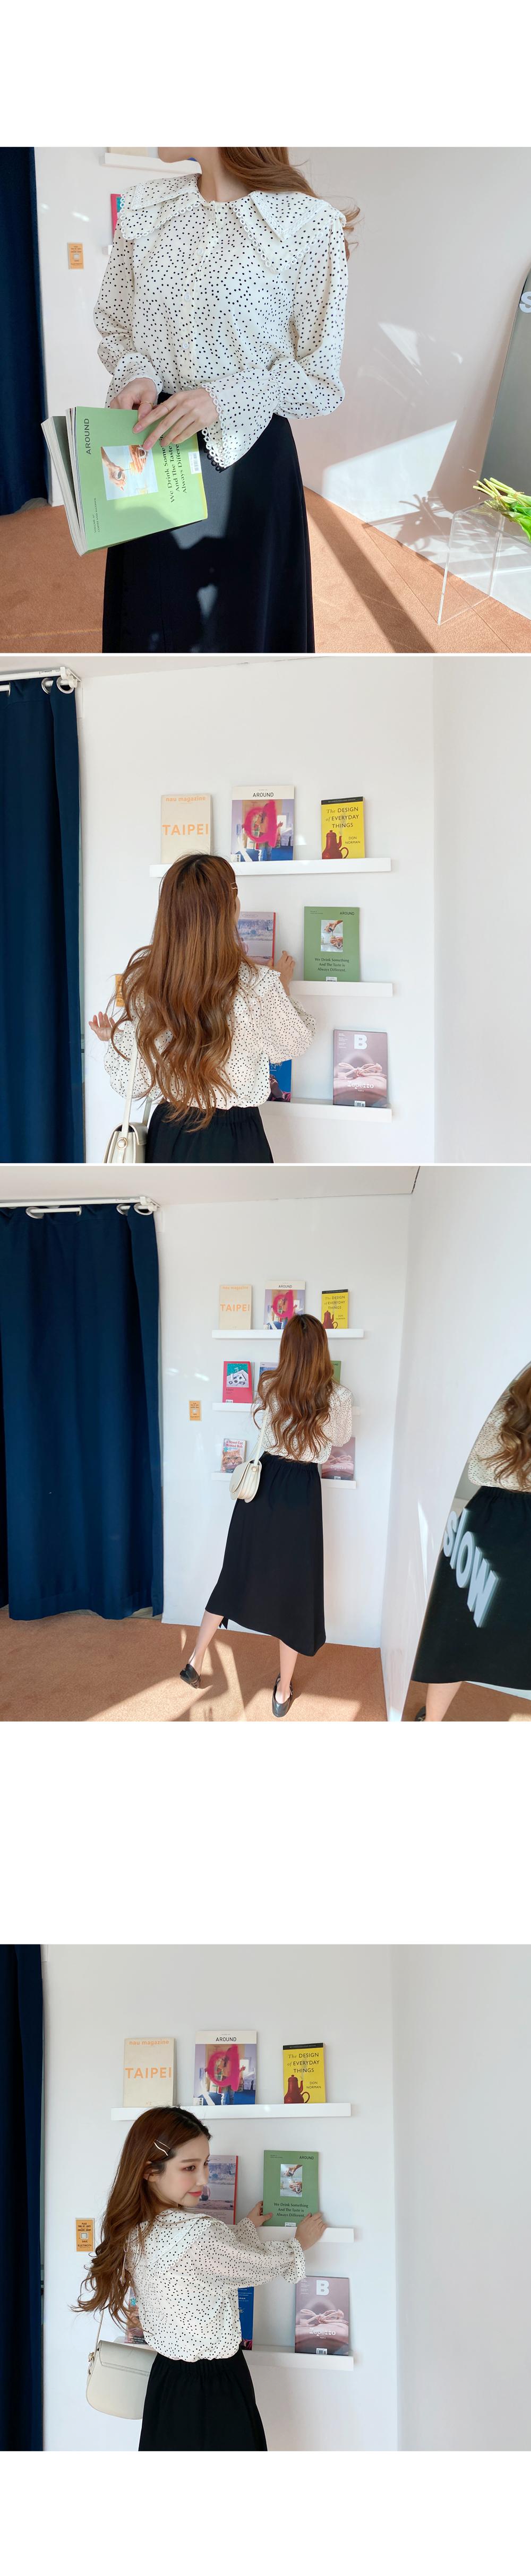 Jandot's Charm Blouse